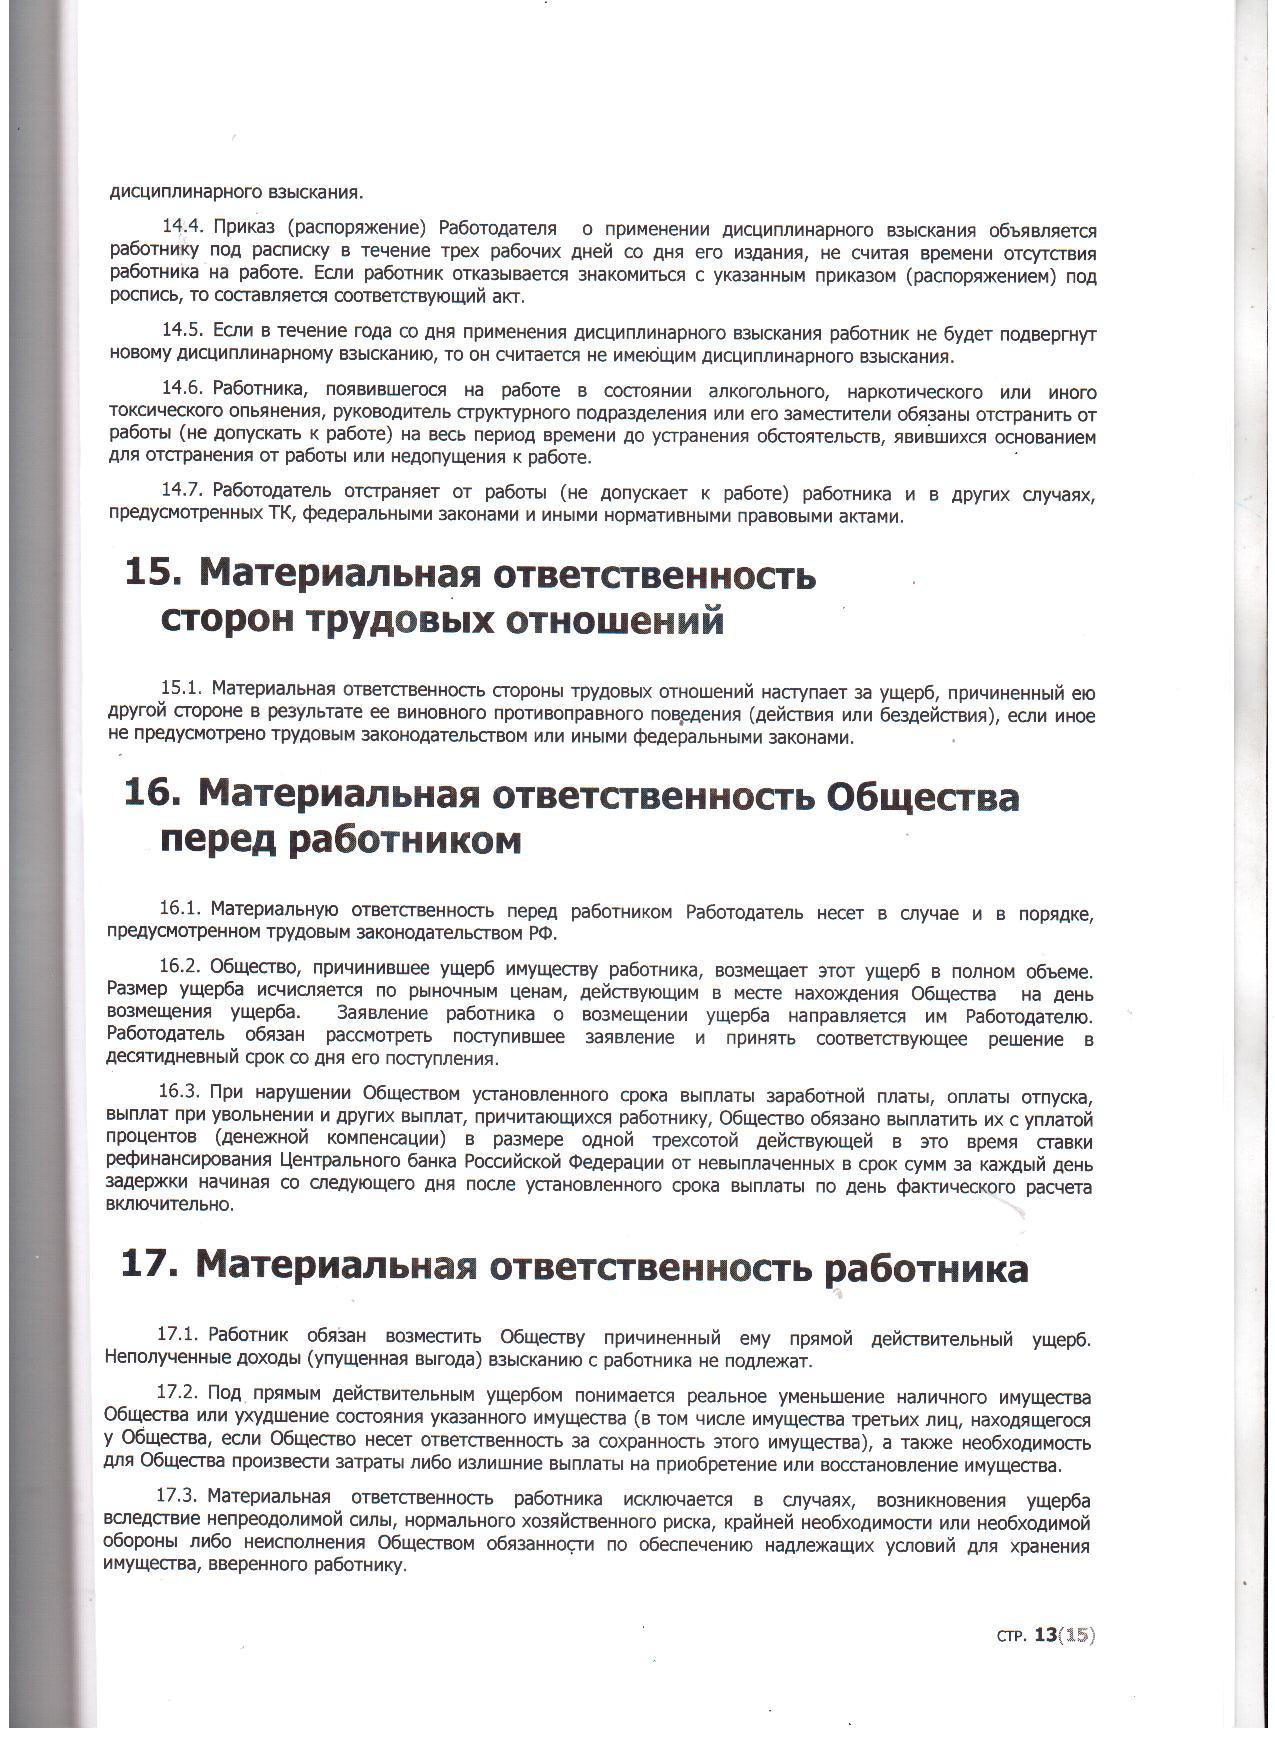 Правила внутреннего трудоговоро распорядка 13